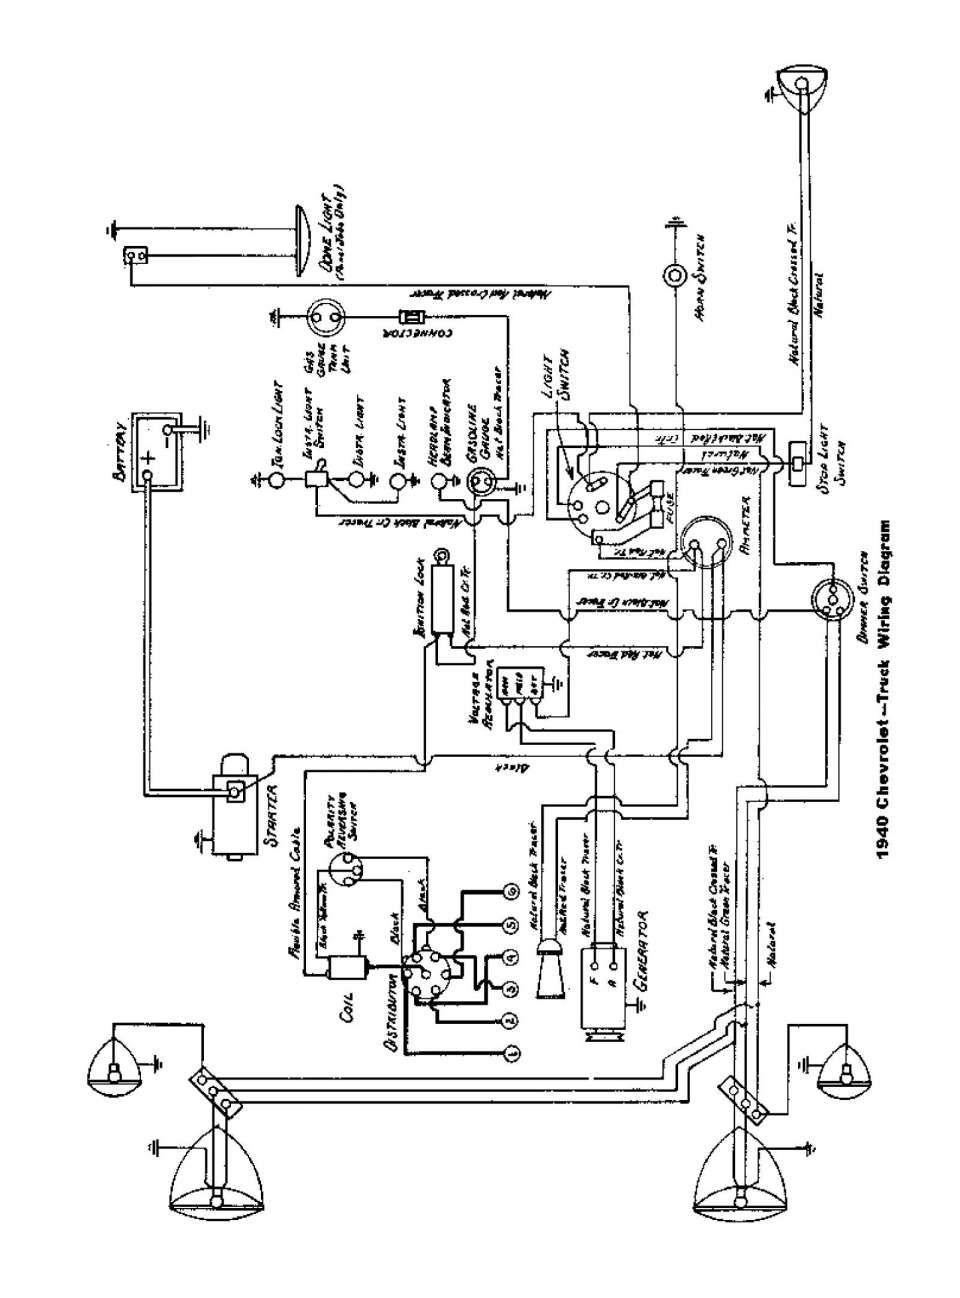 16 Chevy Truck 1946 Wiring Diagram 57 Chevy Trucks 1946 Chevy Truck Chevy Trucks